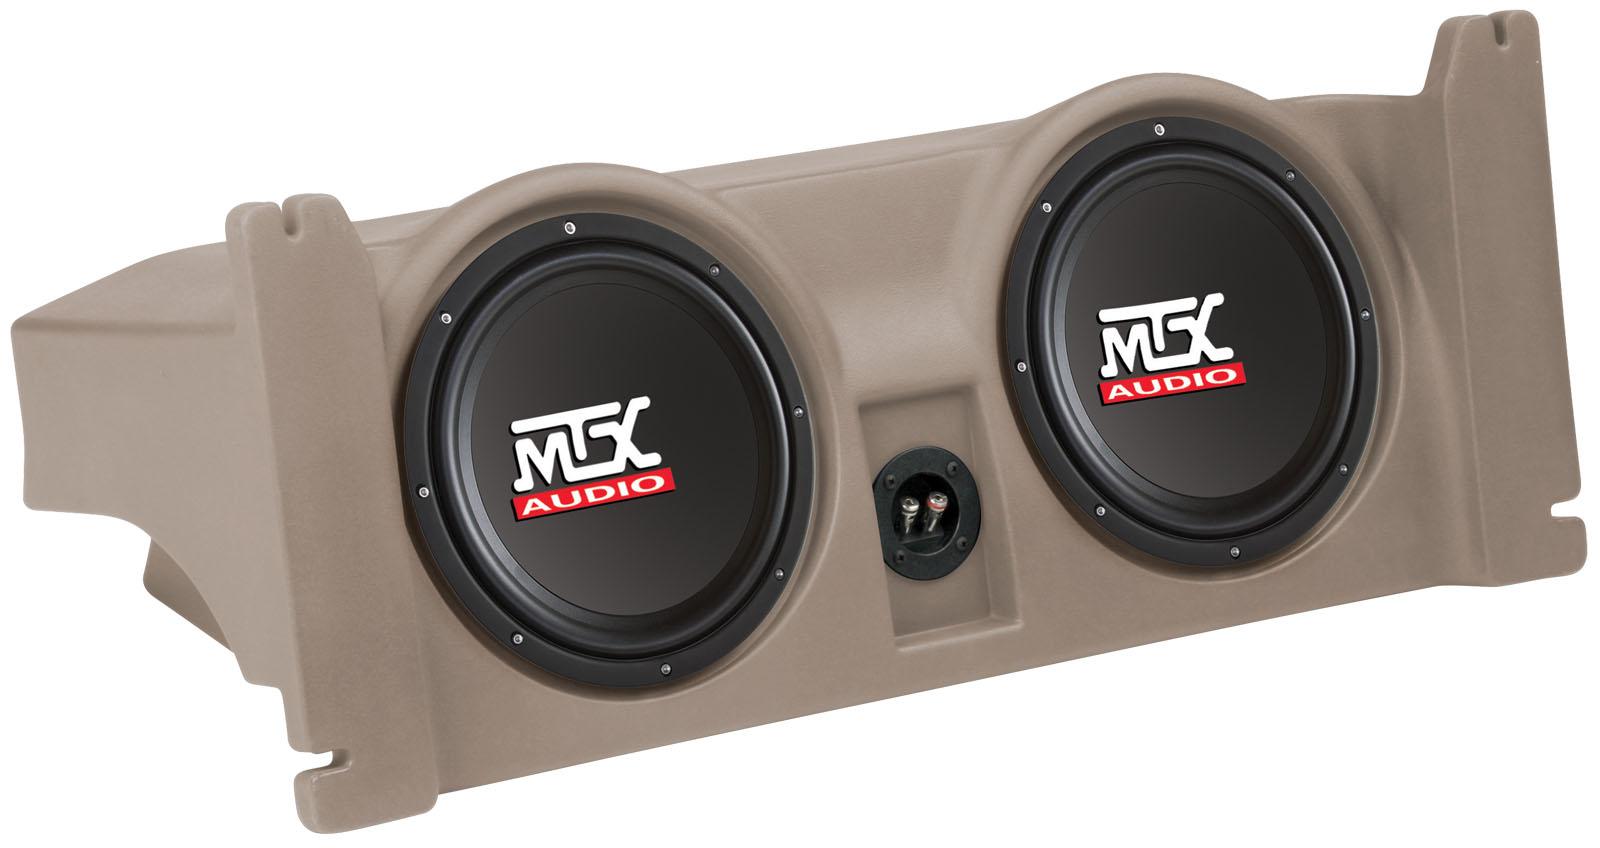 Jeep Wrangler Tj 1997 2006 Thunderform Custom Subwoofer Enclosure Jk Upgrade Mtx Audio Serious About Sound